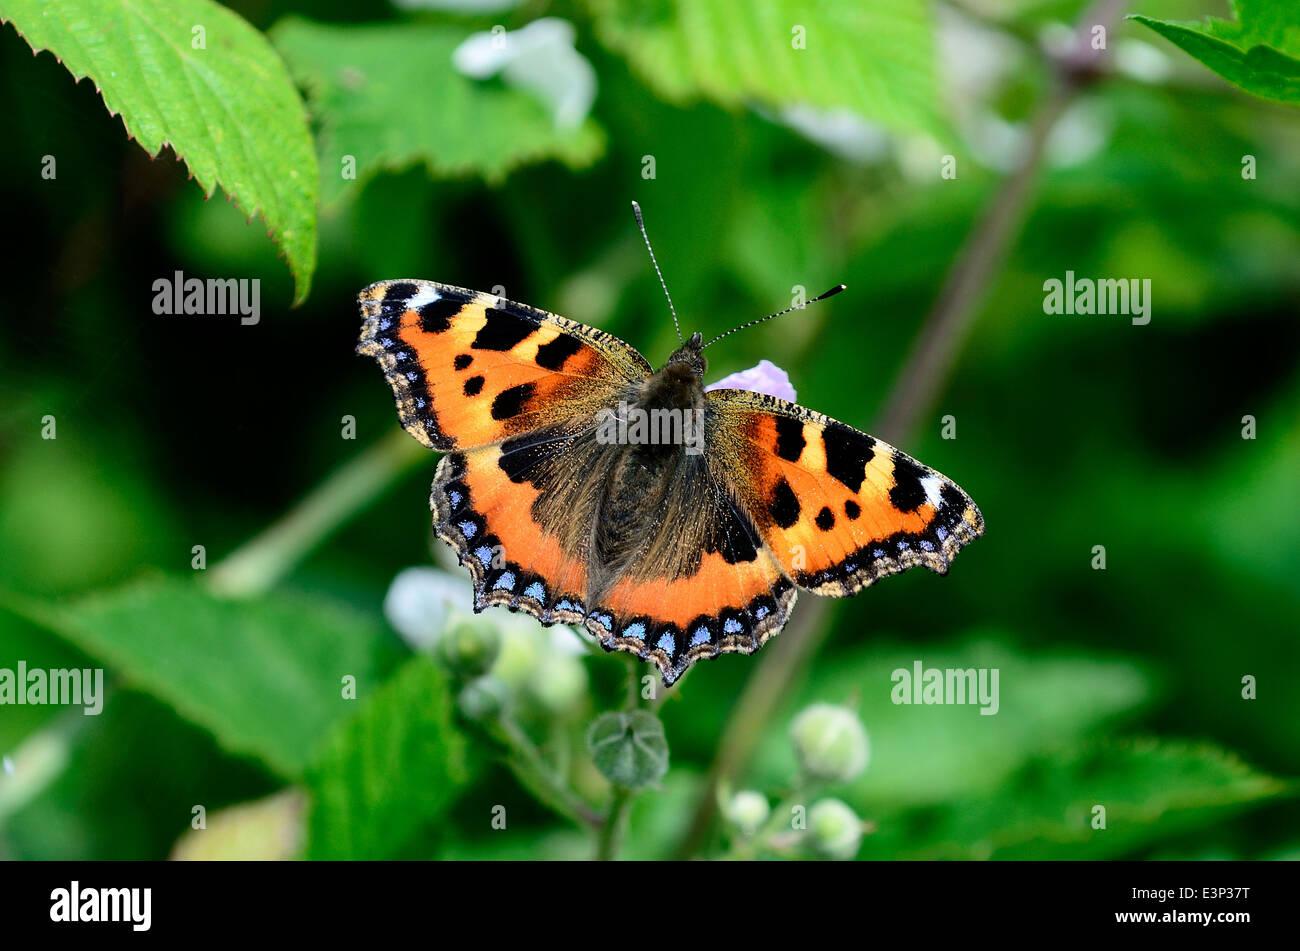 Small tortoiseshell butterfly - Stock Image